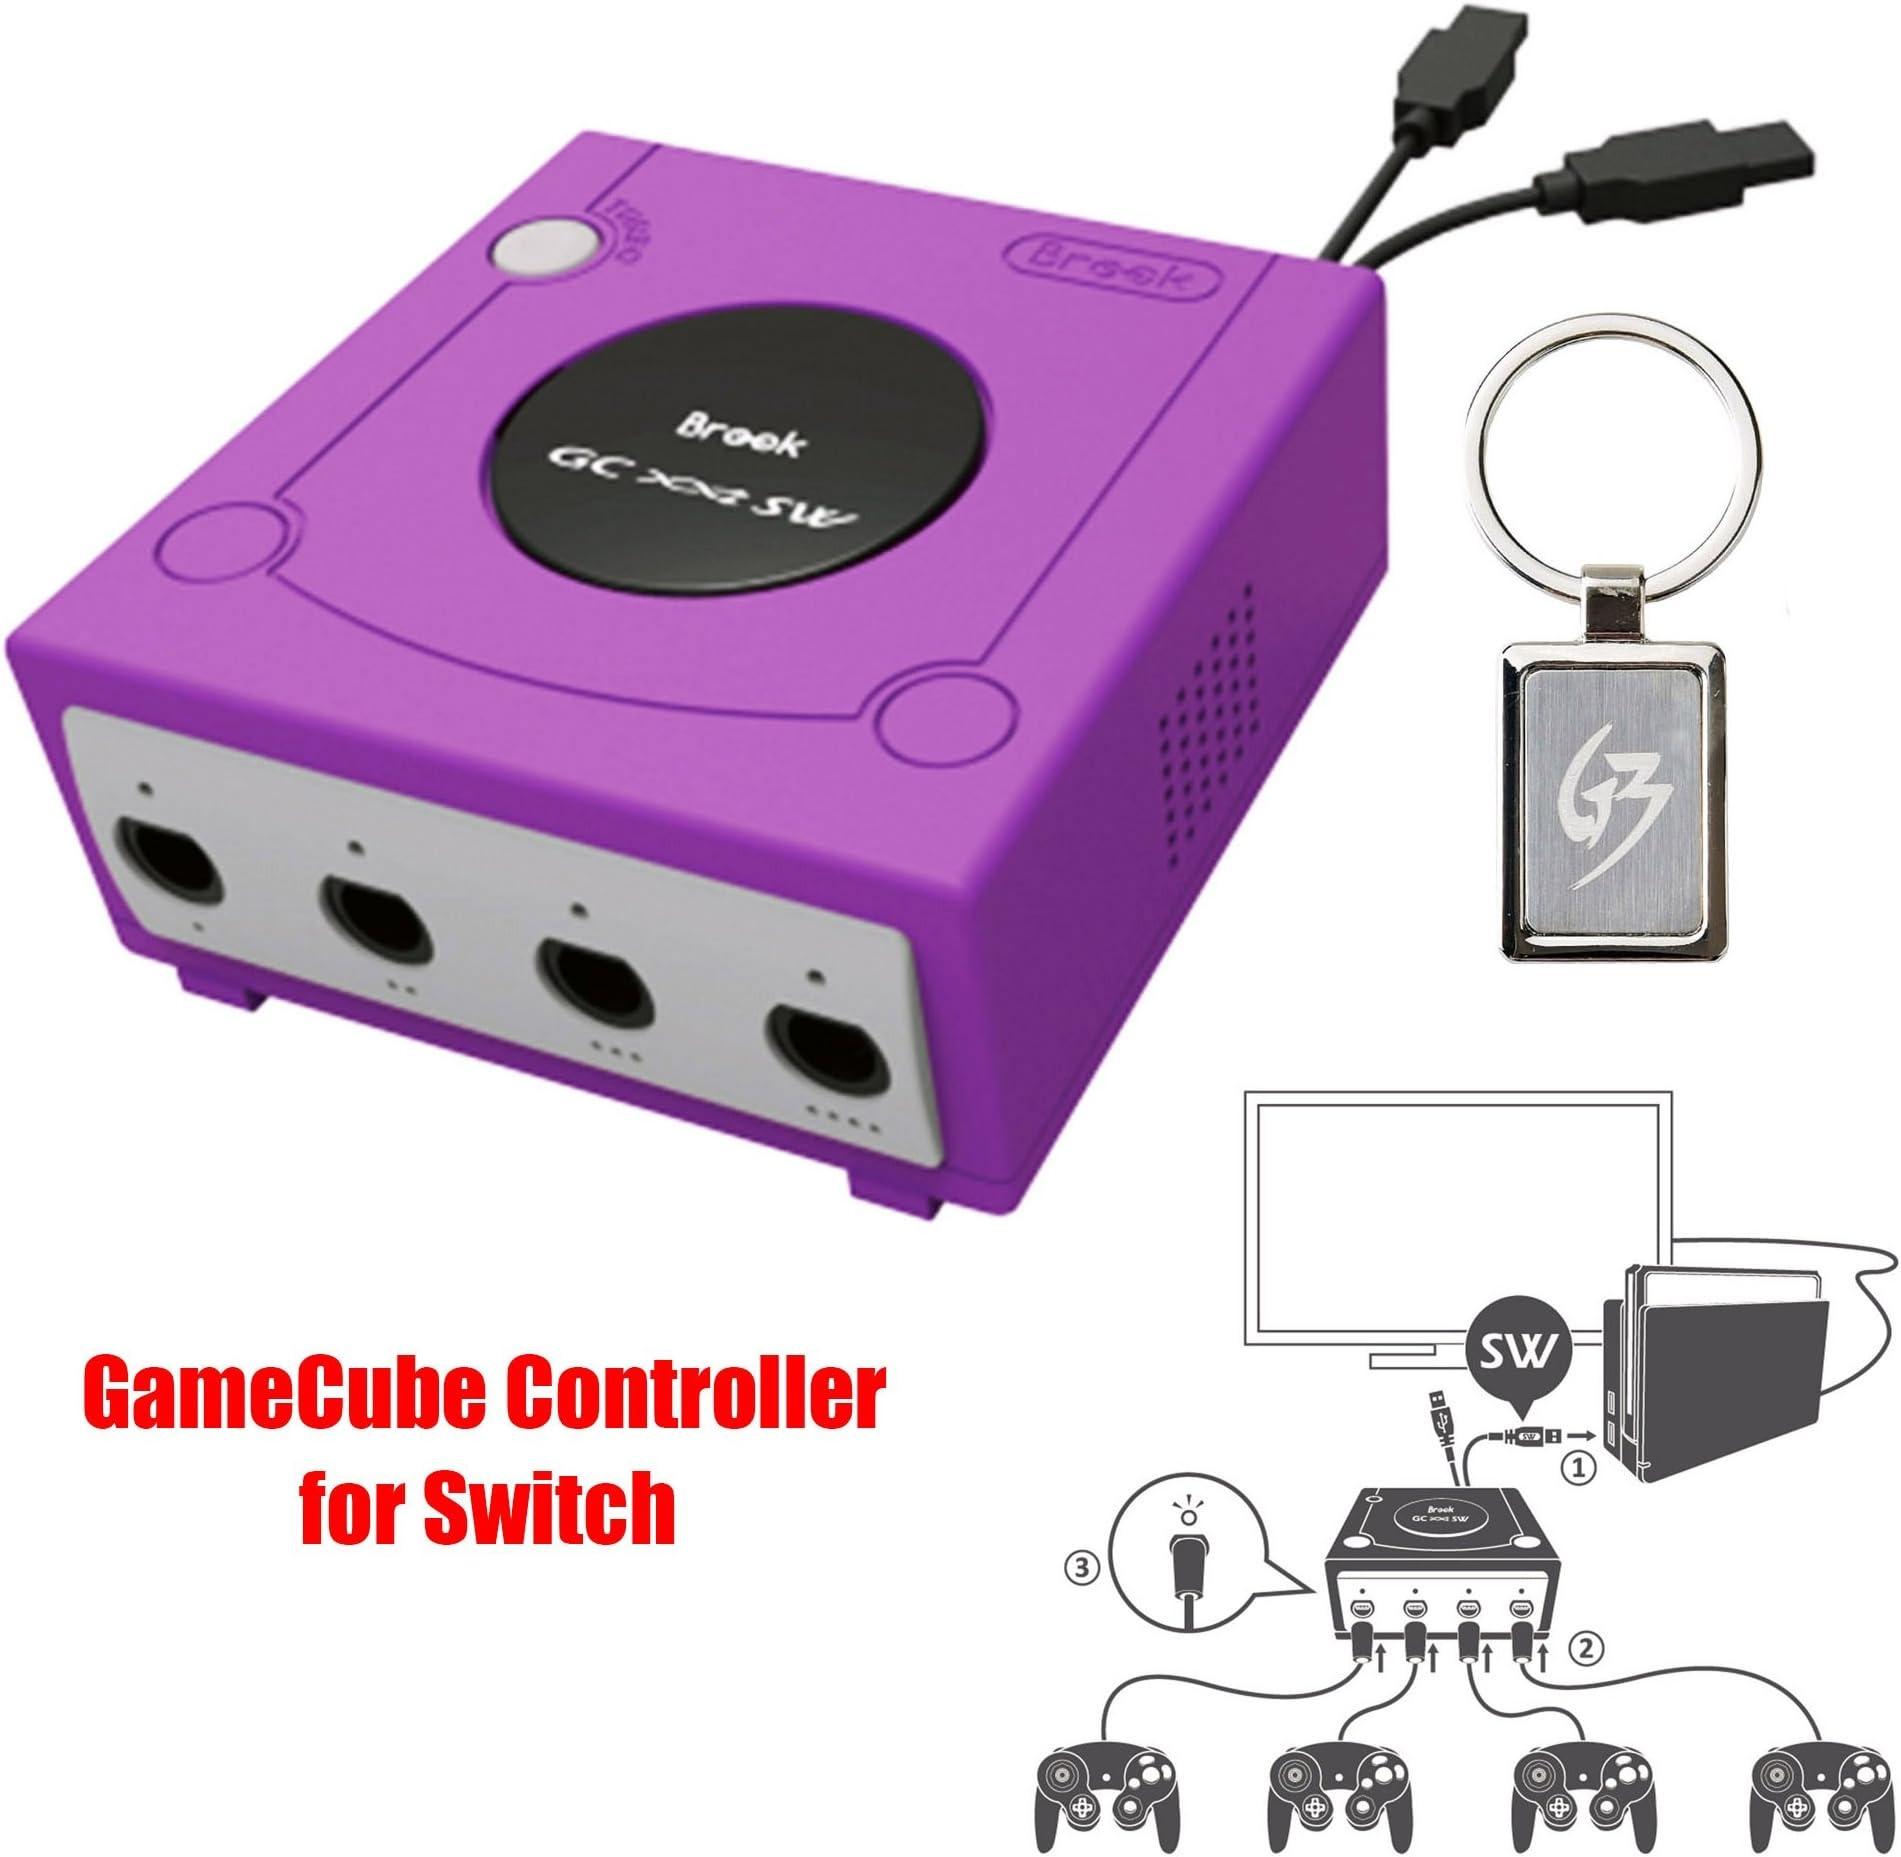 Gamecube Controller Wiring Diagram Trusted Diagrams Wii Illustration Of U2022 Console Schematics